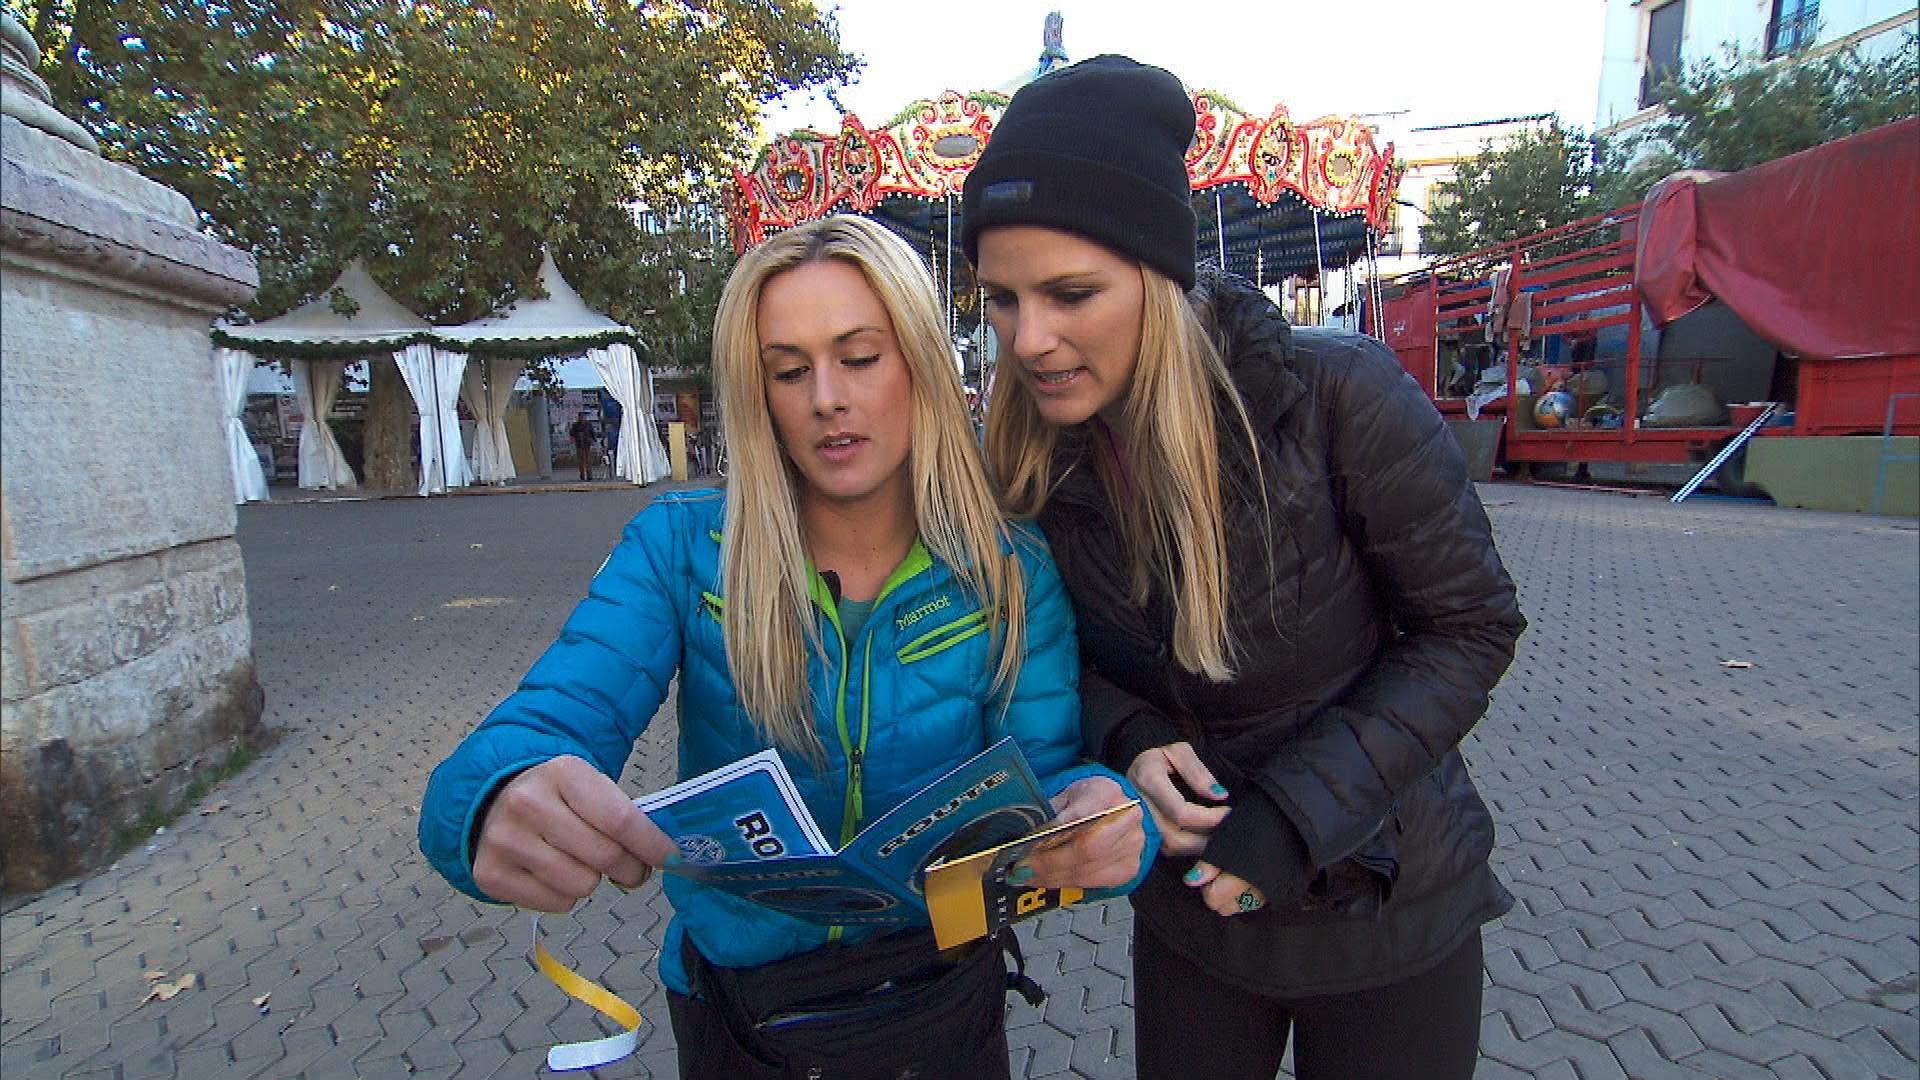 Caroline and Jennifer in Season 24 Episode 10